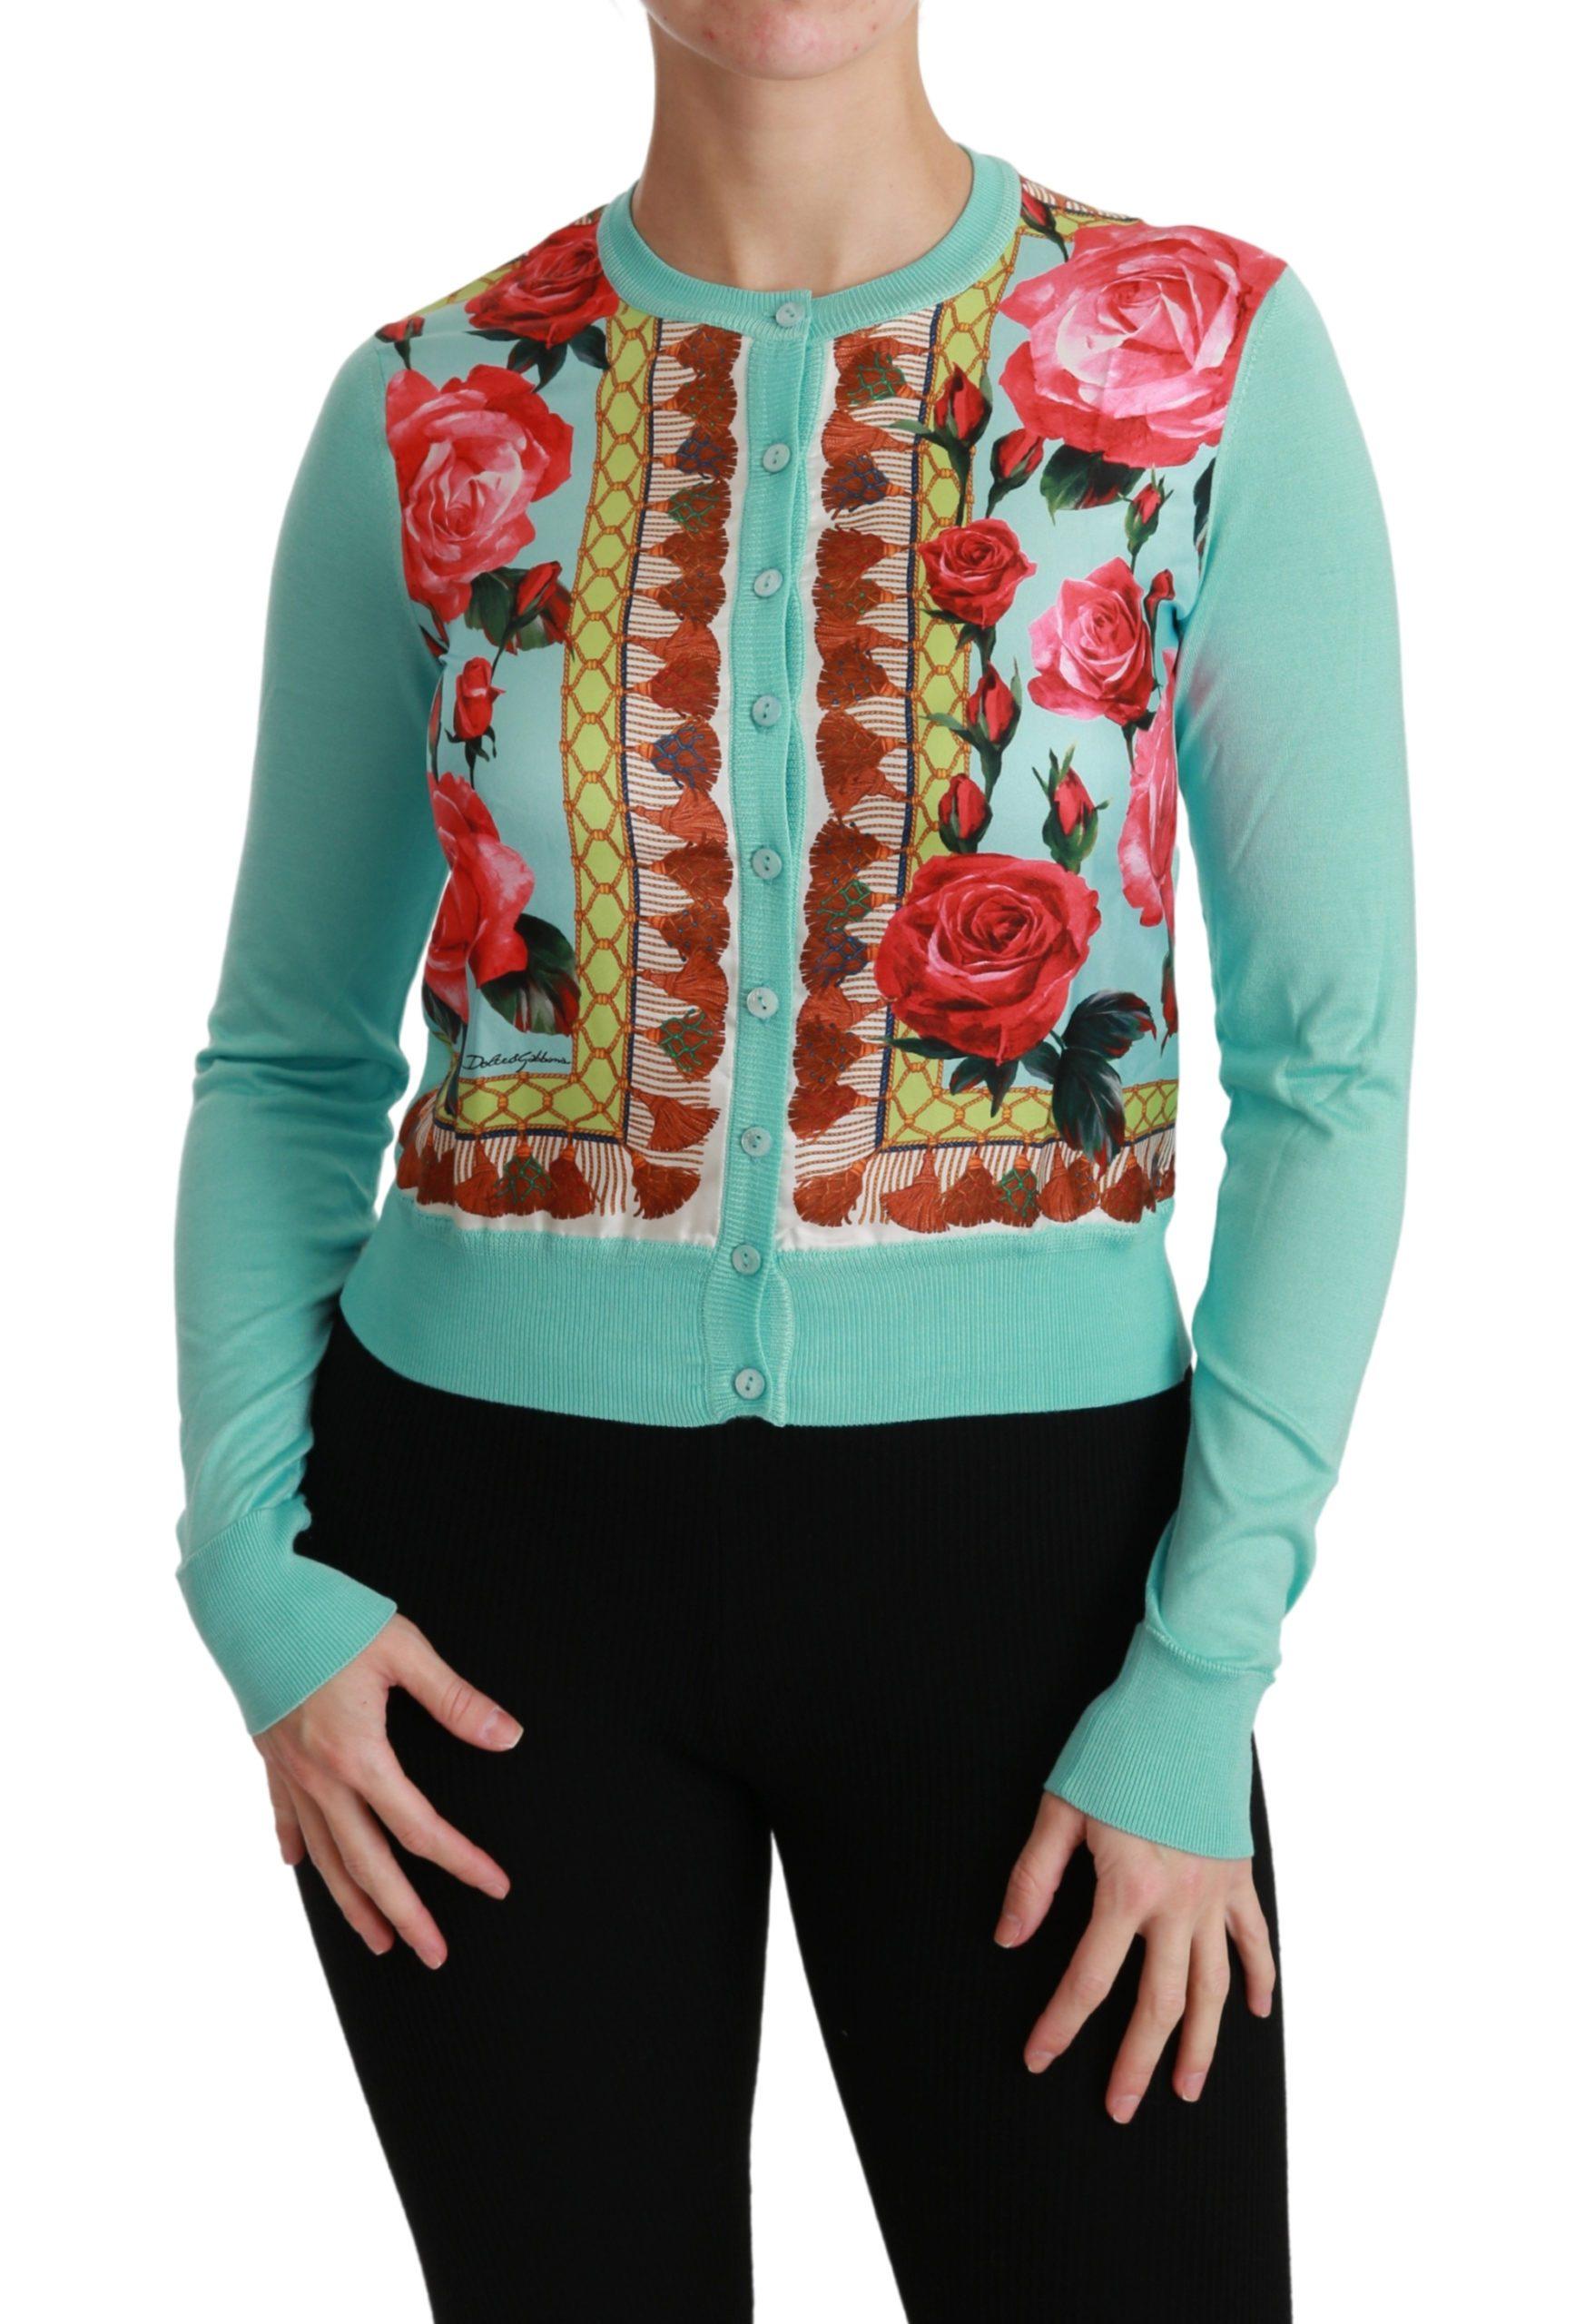 Dolce & Gabbana Women's Roses Floral Silk Cardigan TSH4493 - IT36 | XS